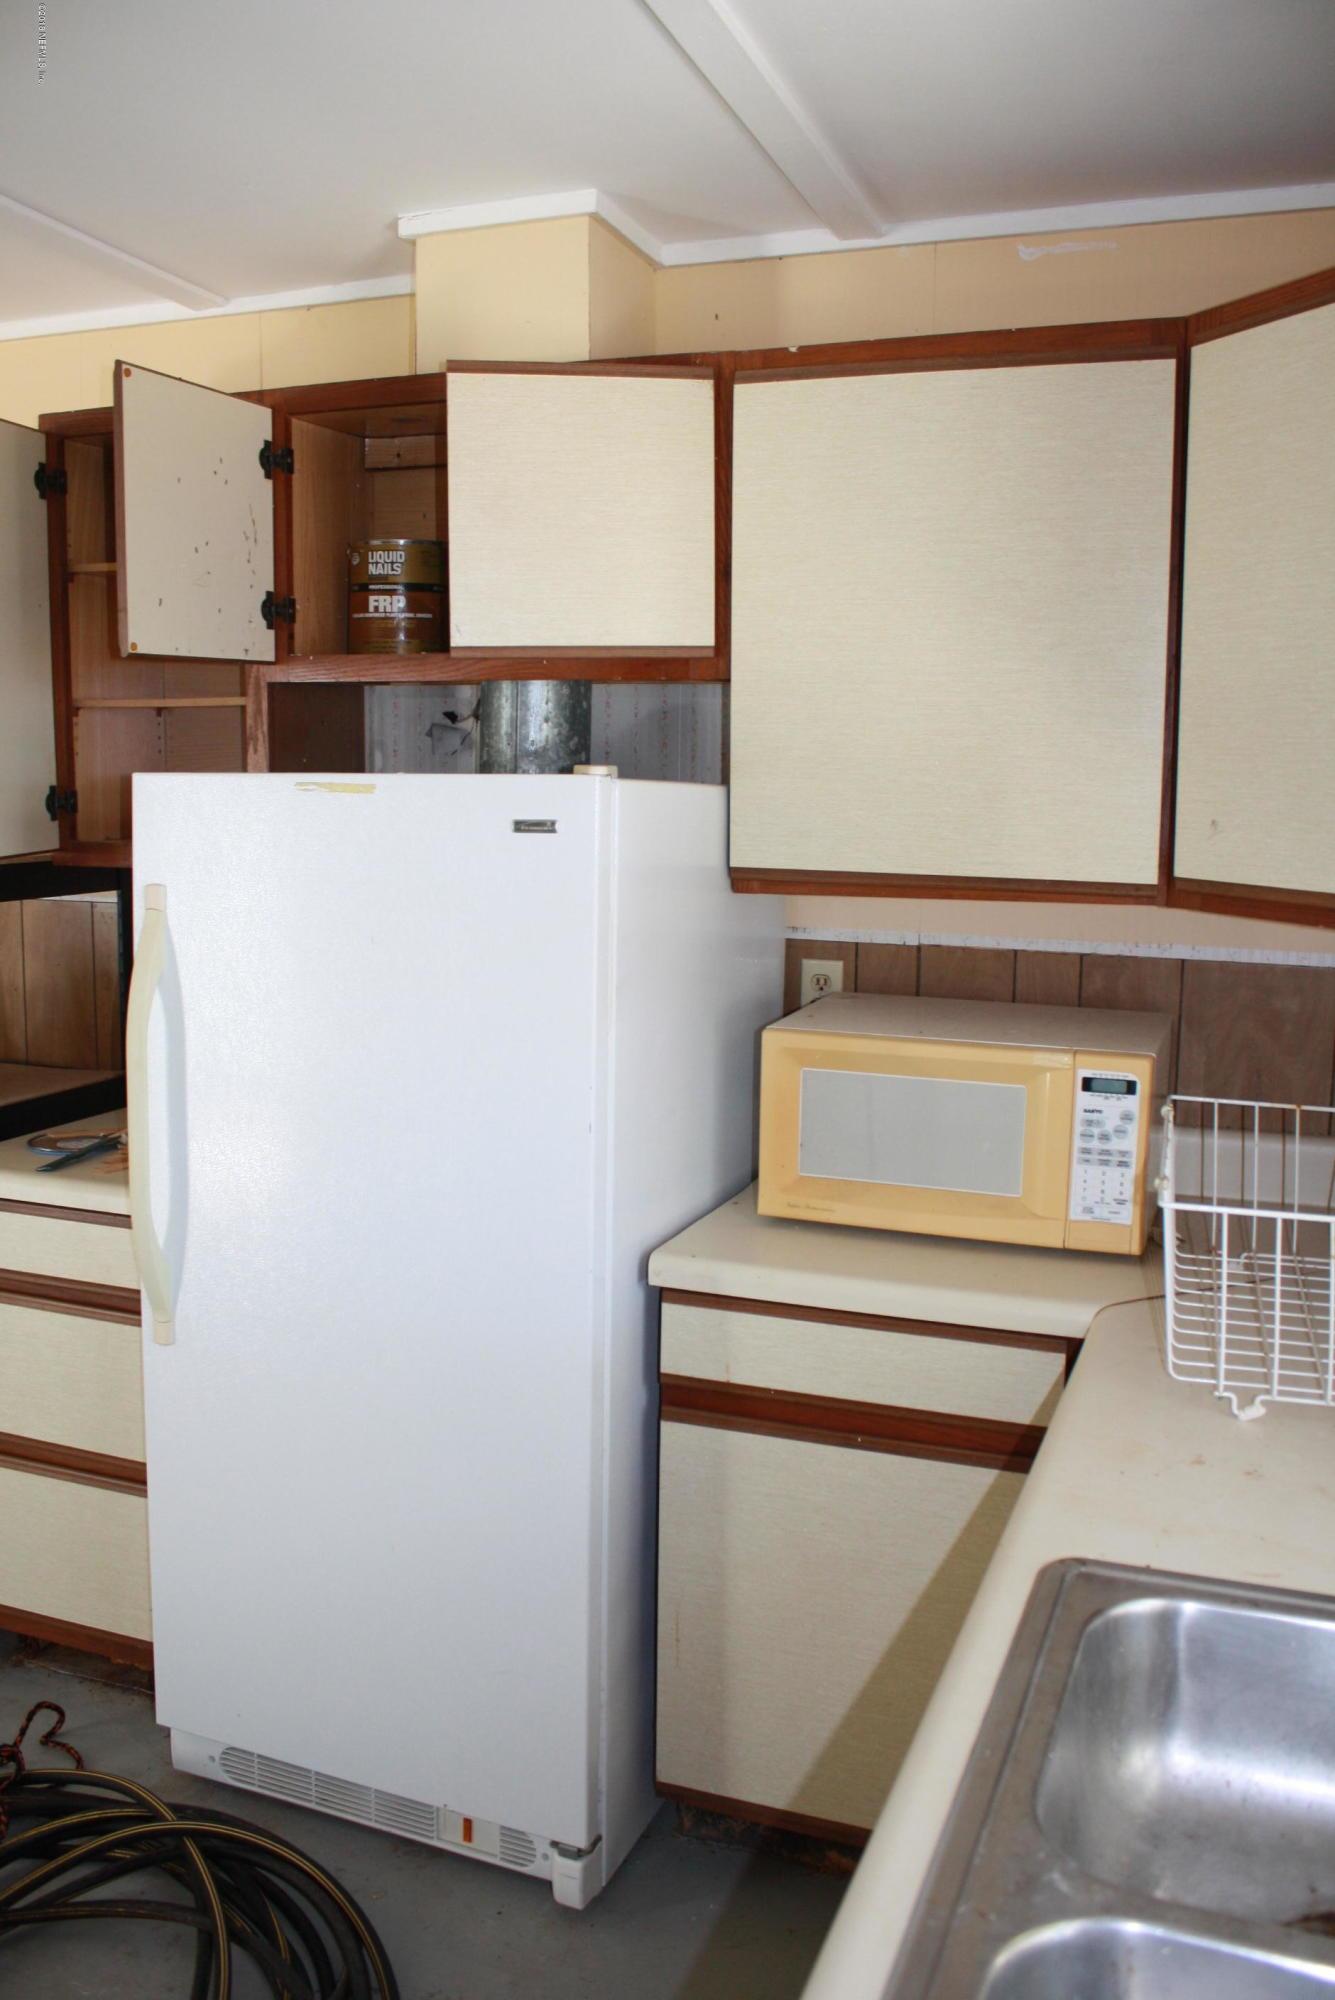 132 BEECHERS POINT, WELAKA, FLORIDA 32193, 3 Bedrooms Bedrooms, ,2 BathroomsBathrooms,Residential - single family,For sale,BEECHERS POINT,927936